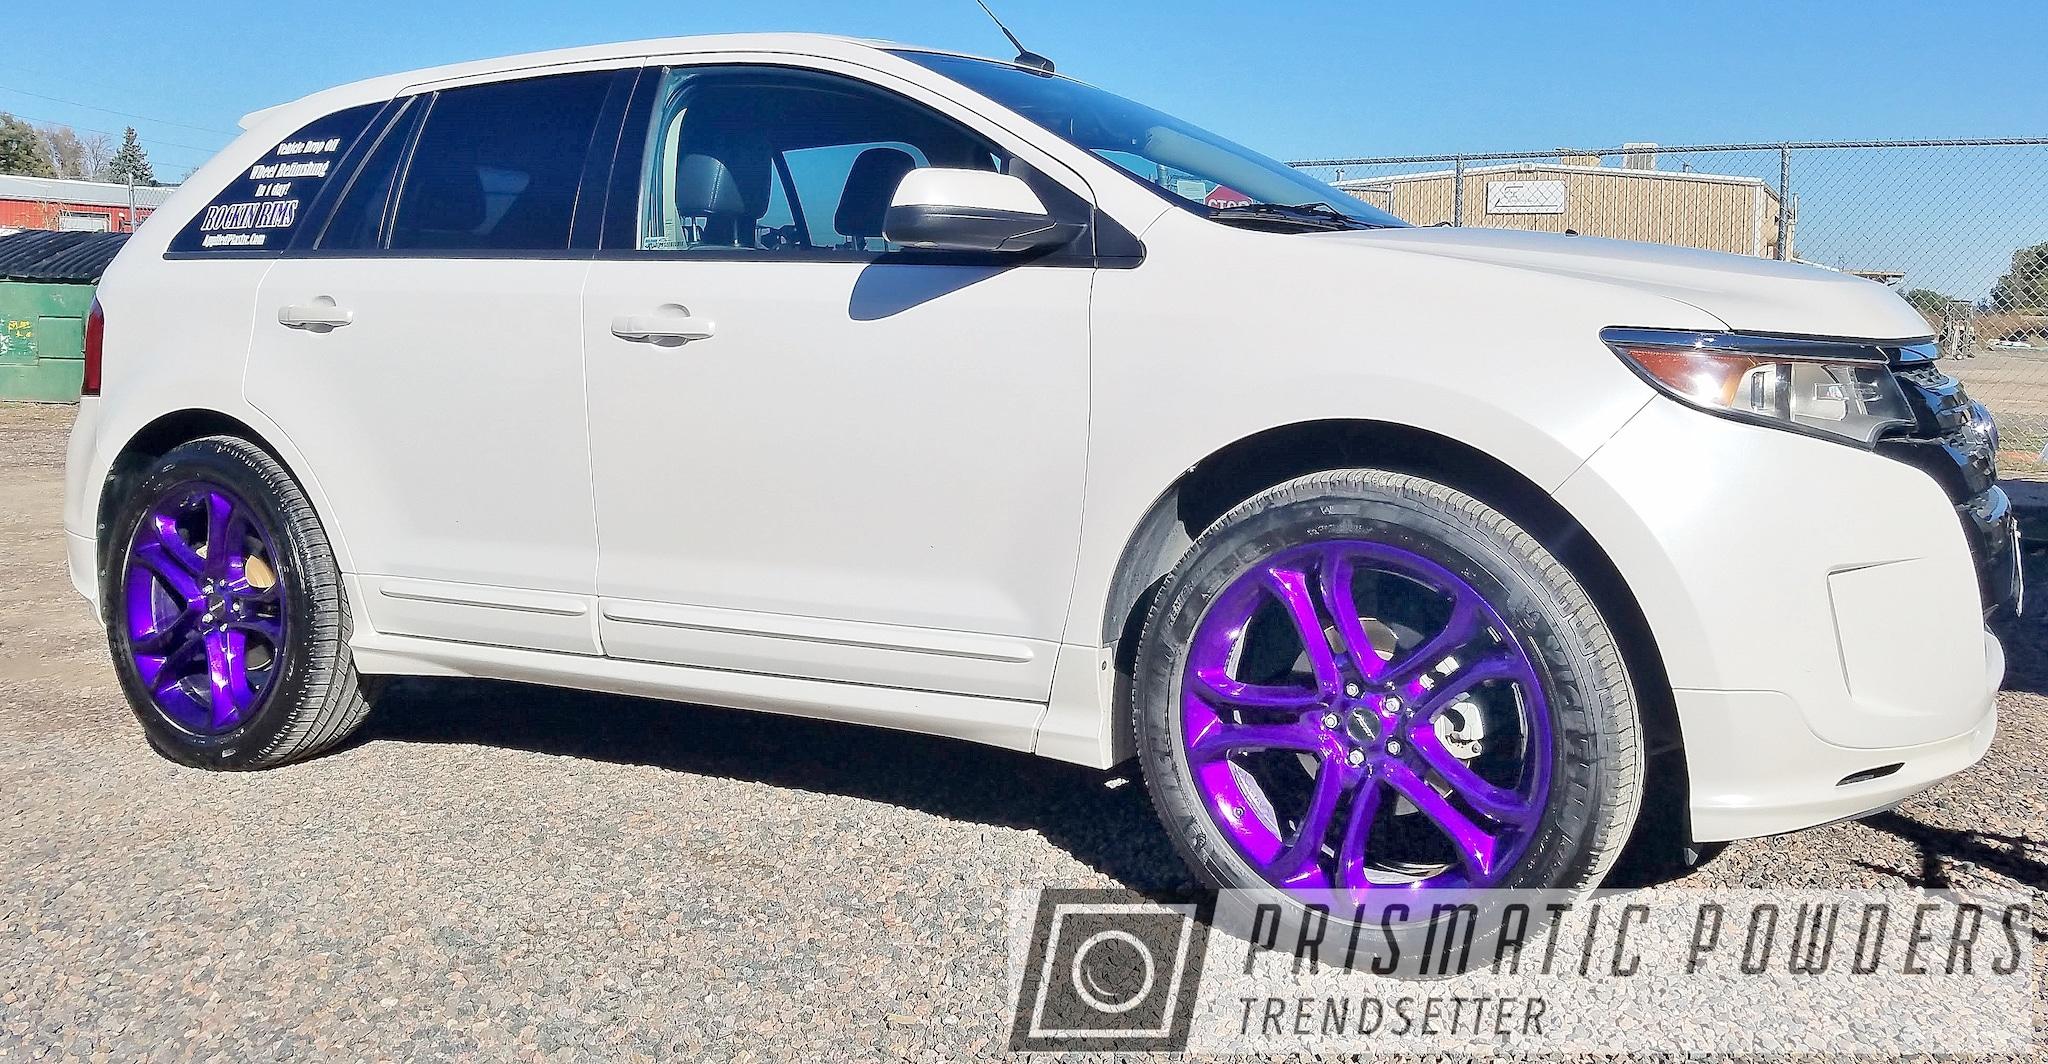 "Powder Coating: Illusion Purple PSB-4629,Wheels,Automotive,rockin rims,Clear Vision PPS-2974,Rims,Applied Plastic Coatings,22"" Aluminum Rims,Purple wheels"